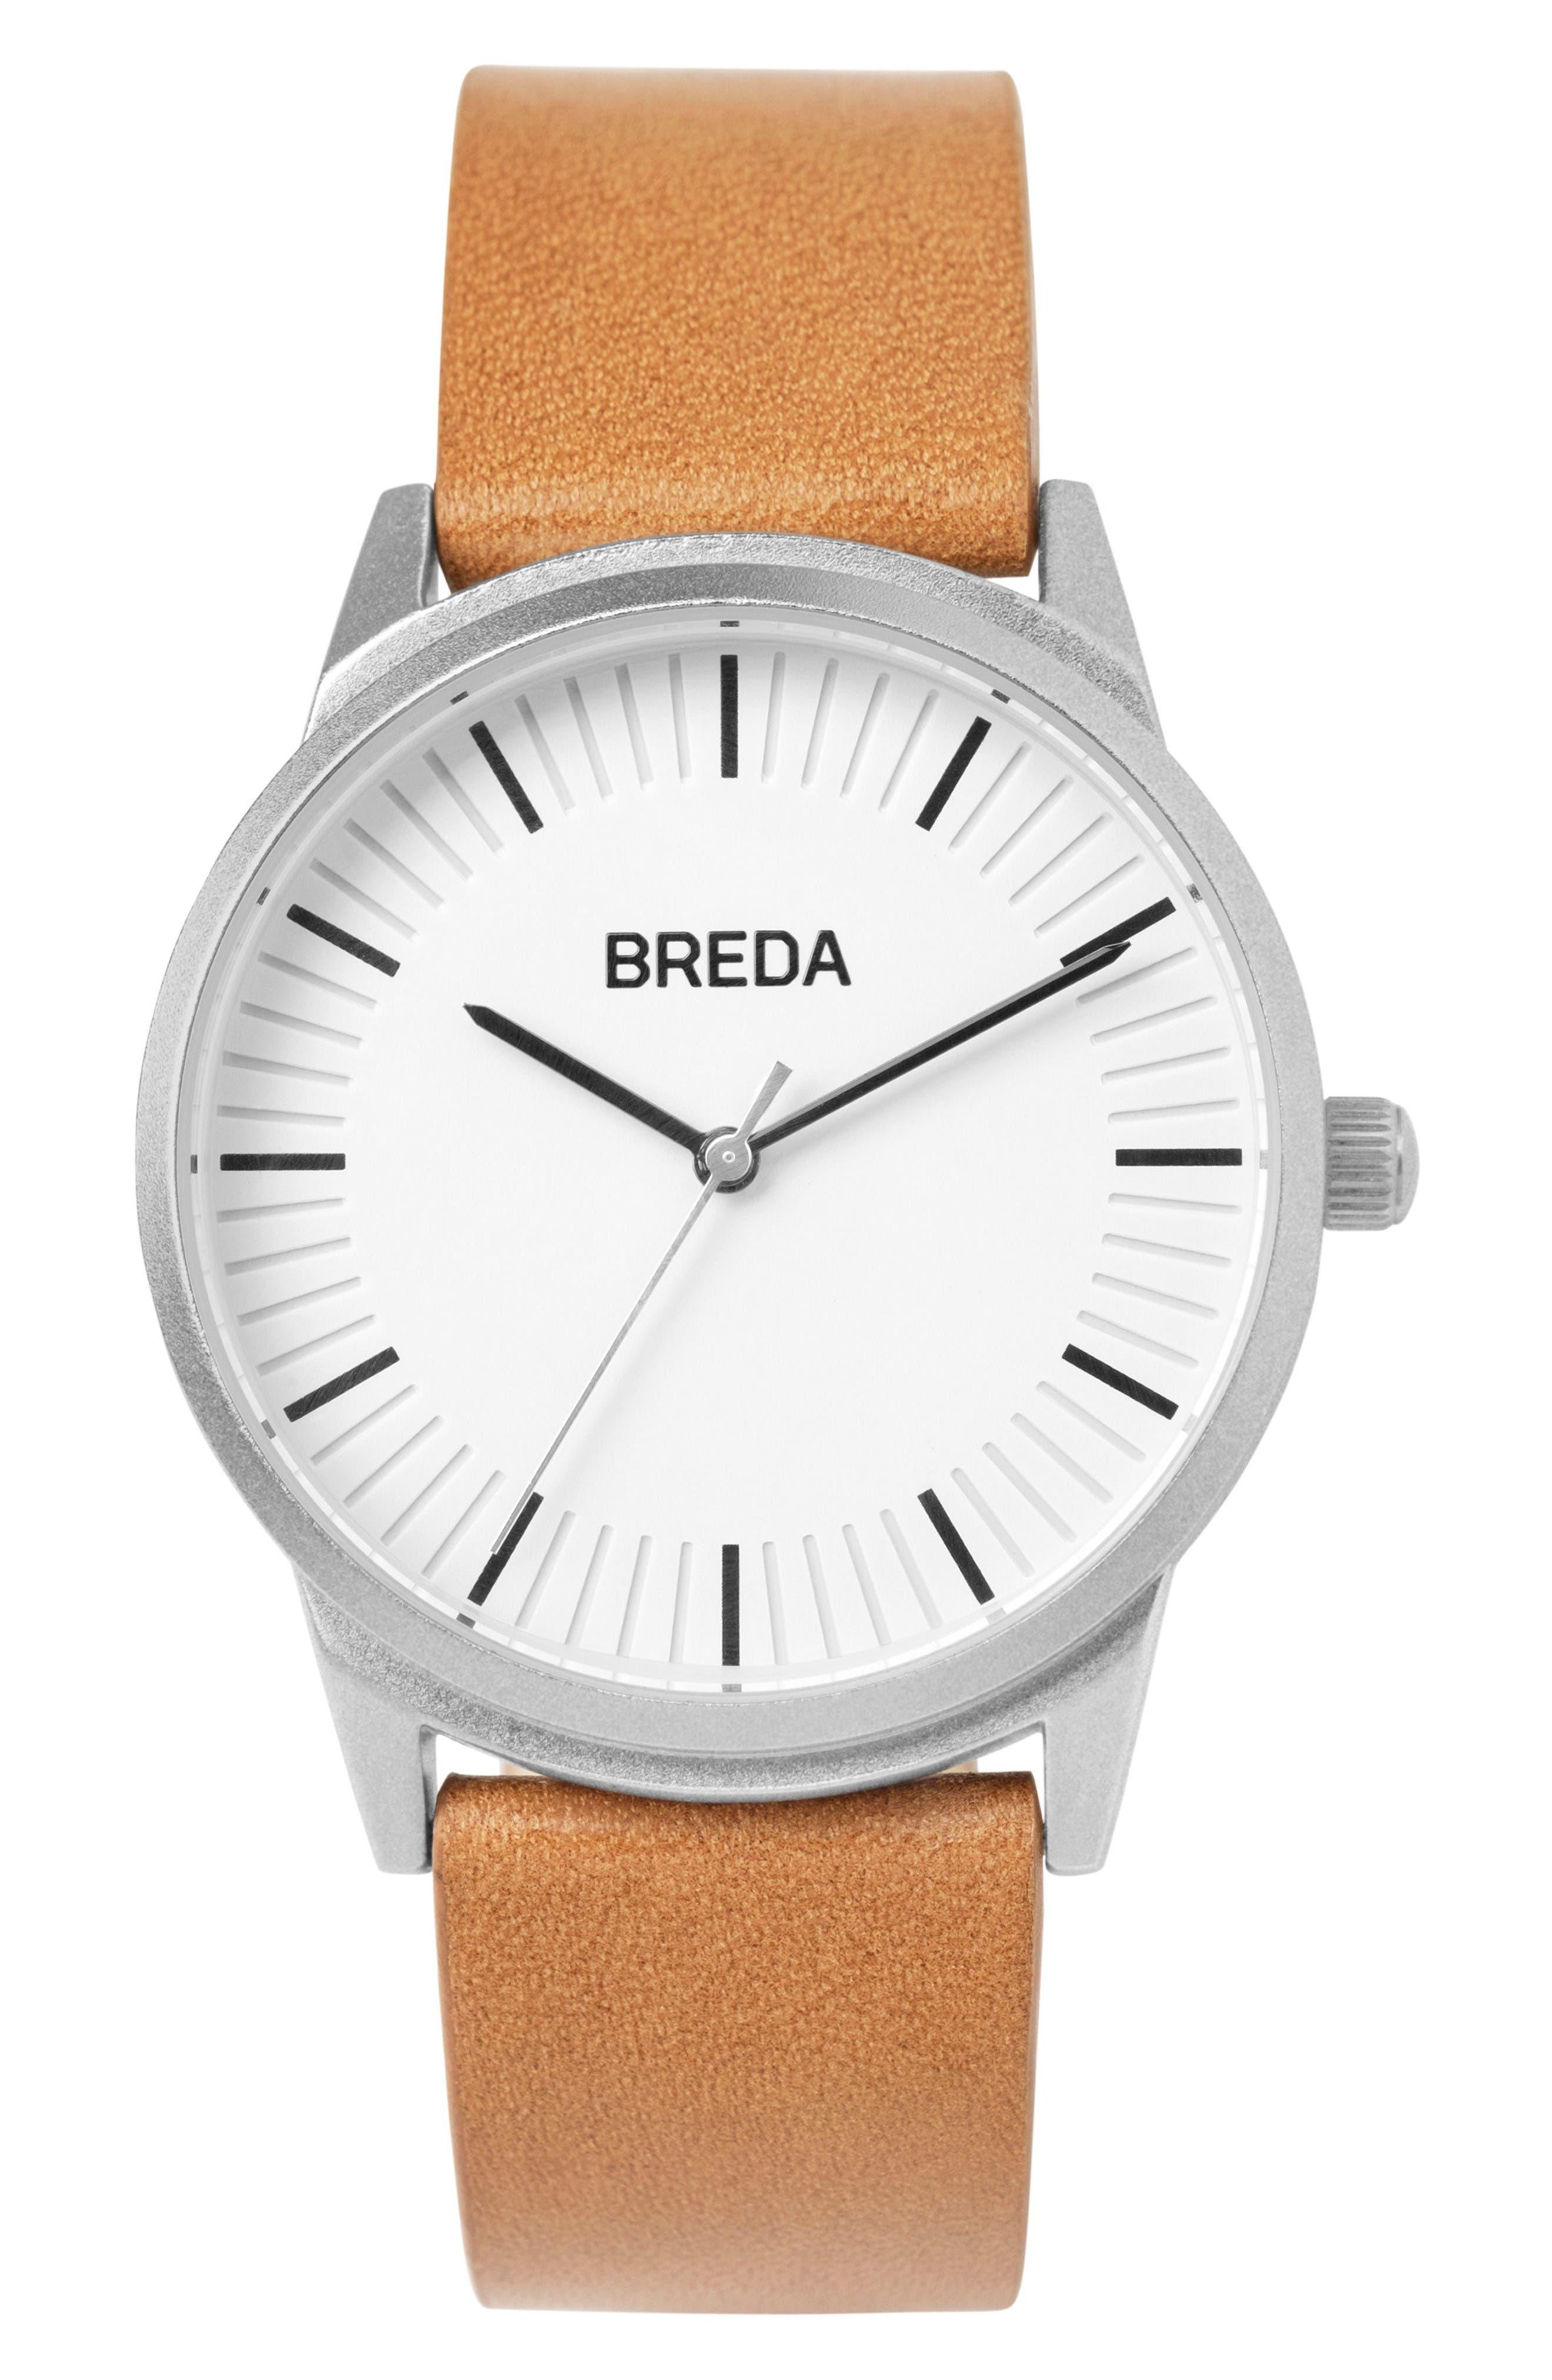 BREDA Bresson Leather Strap Watch, 42mm